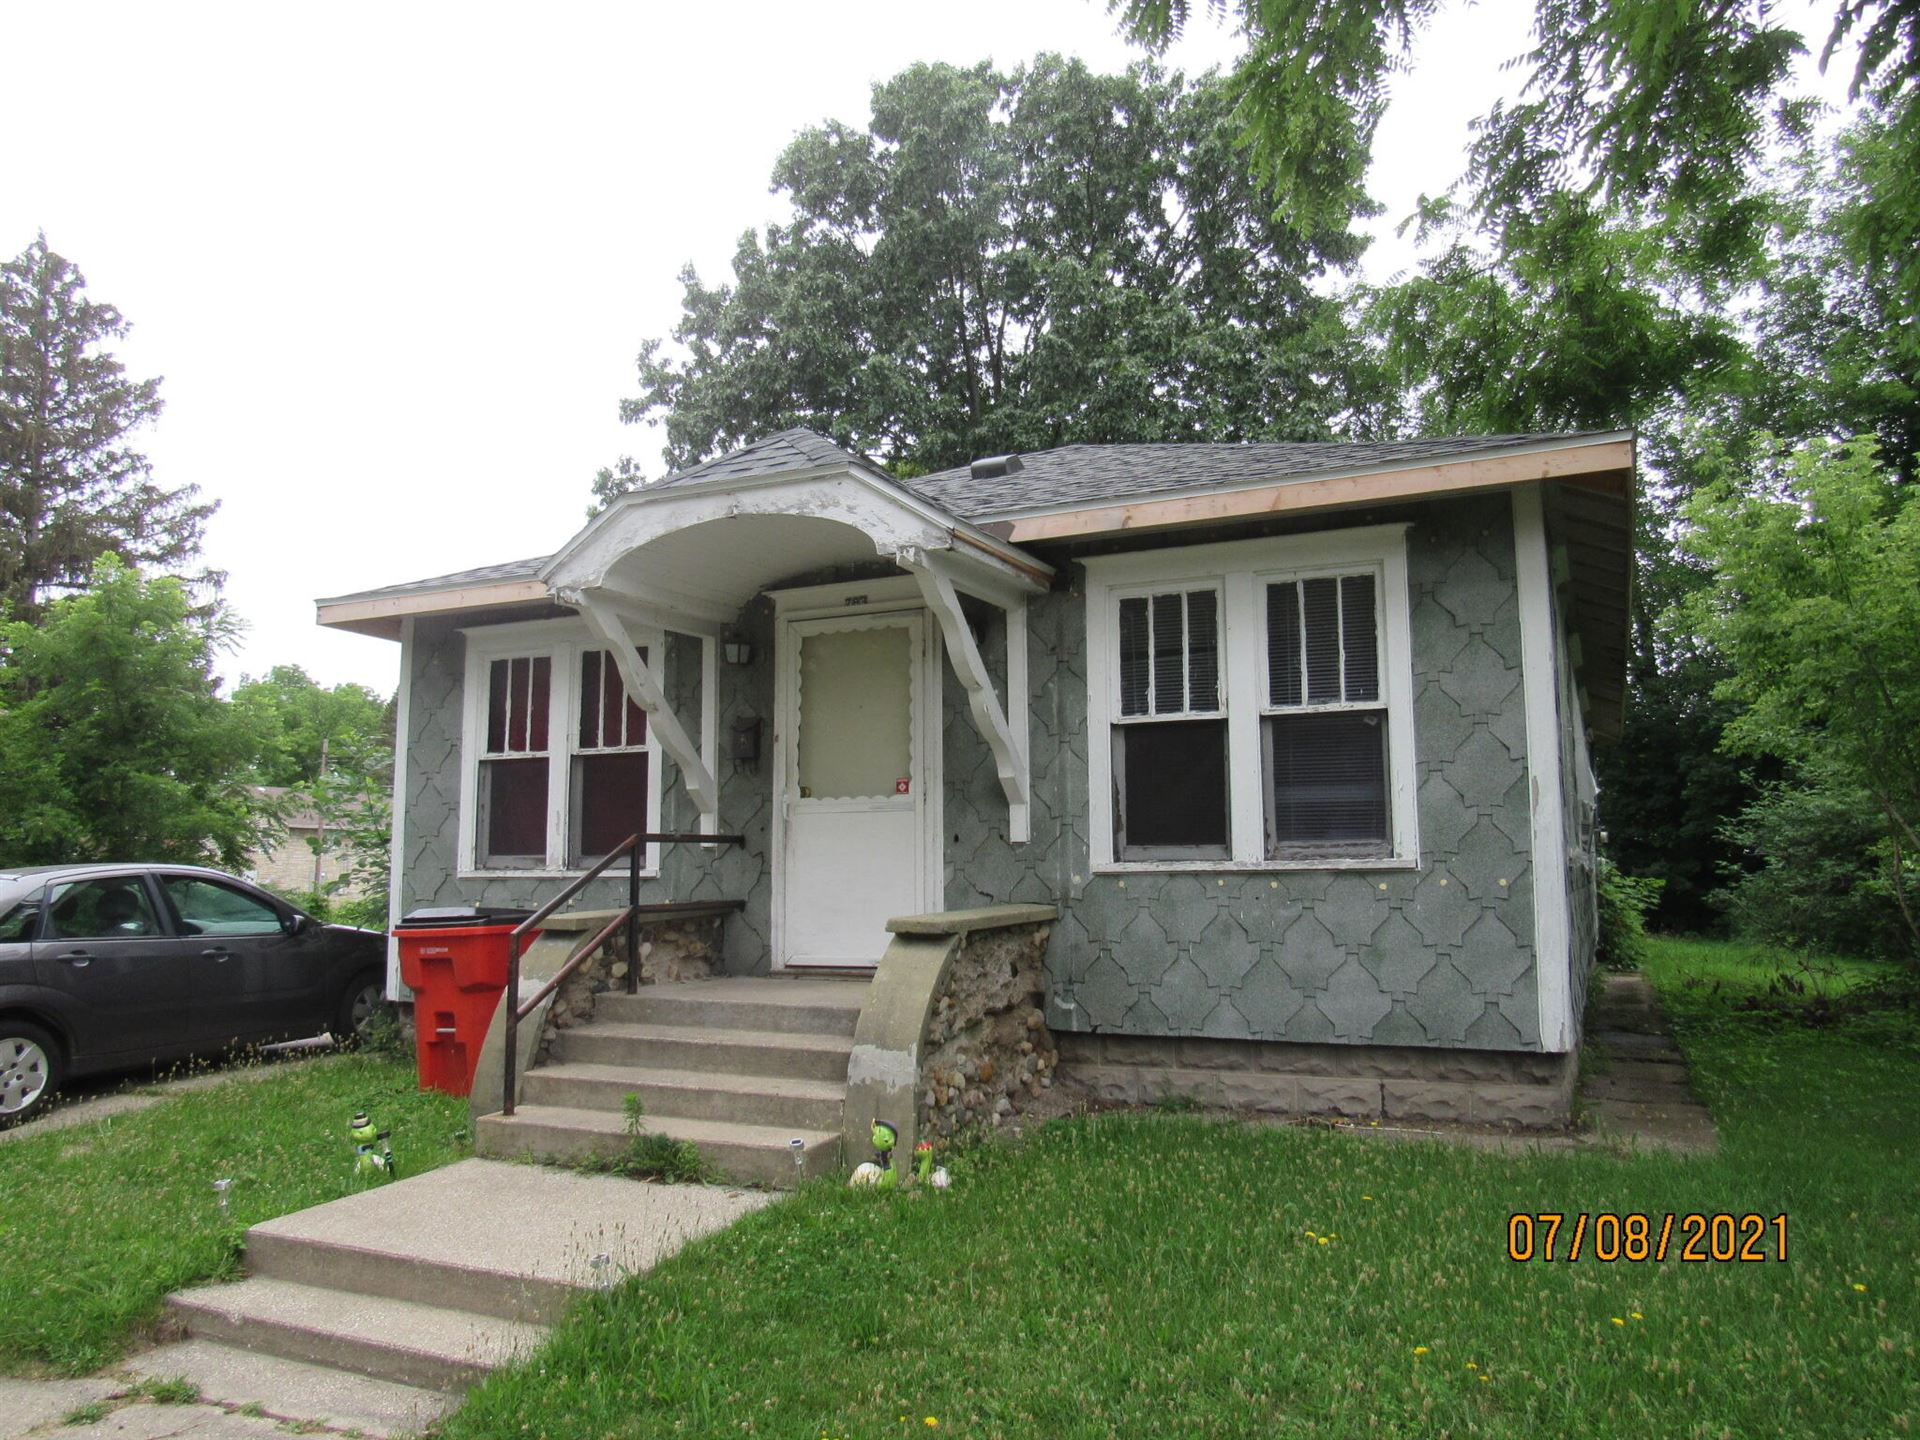 783 Edgecumbe Avenue, Benton Harbor, MI 49022 - MLS#: 21064790